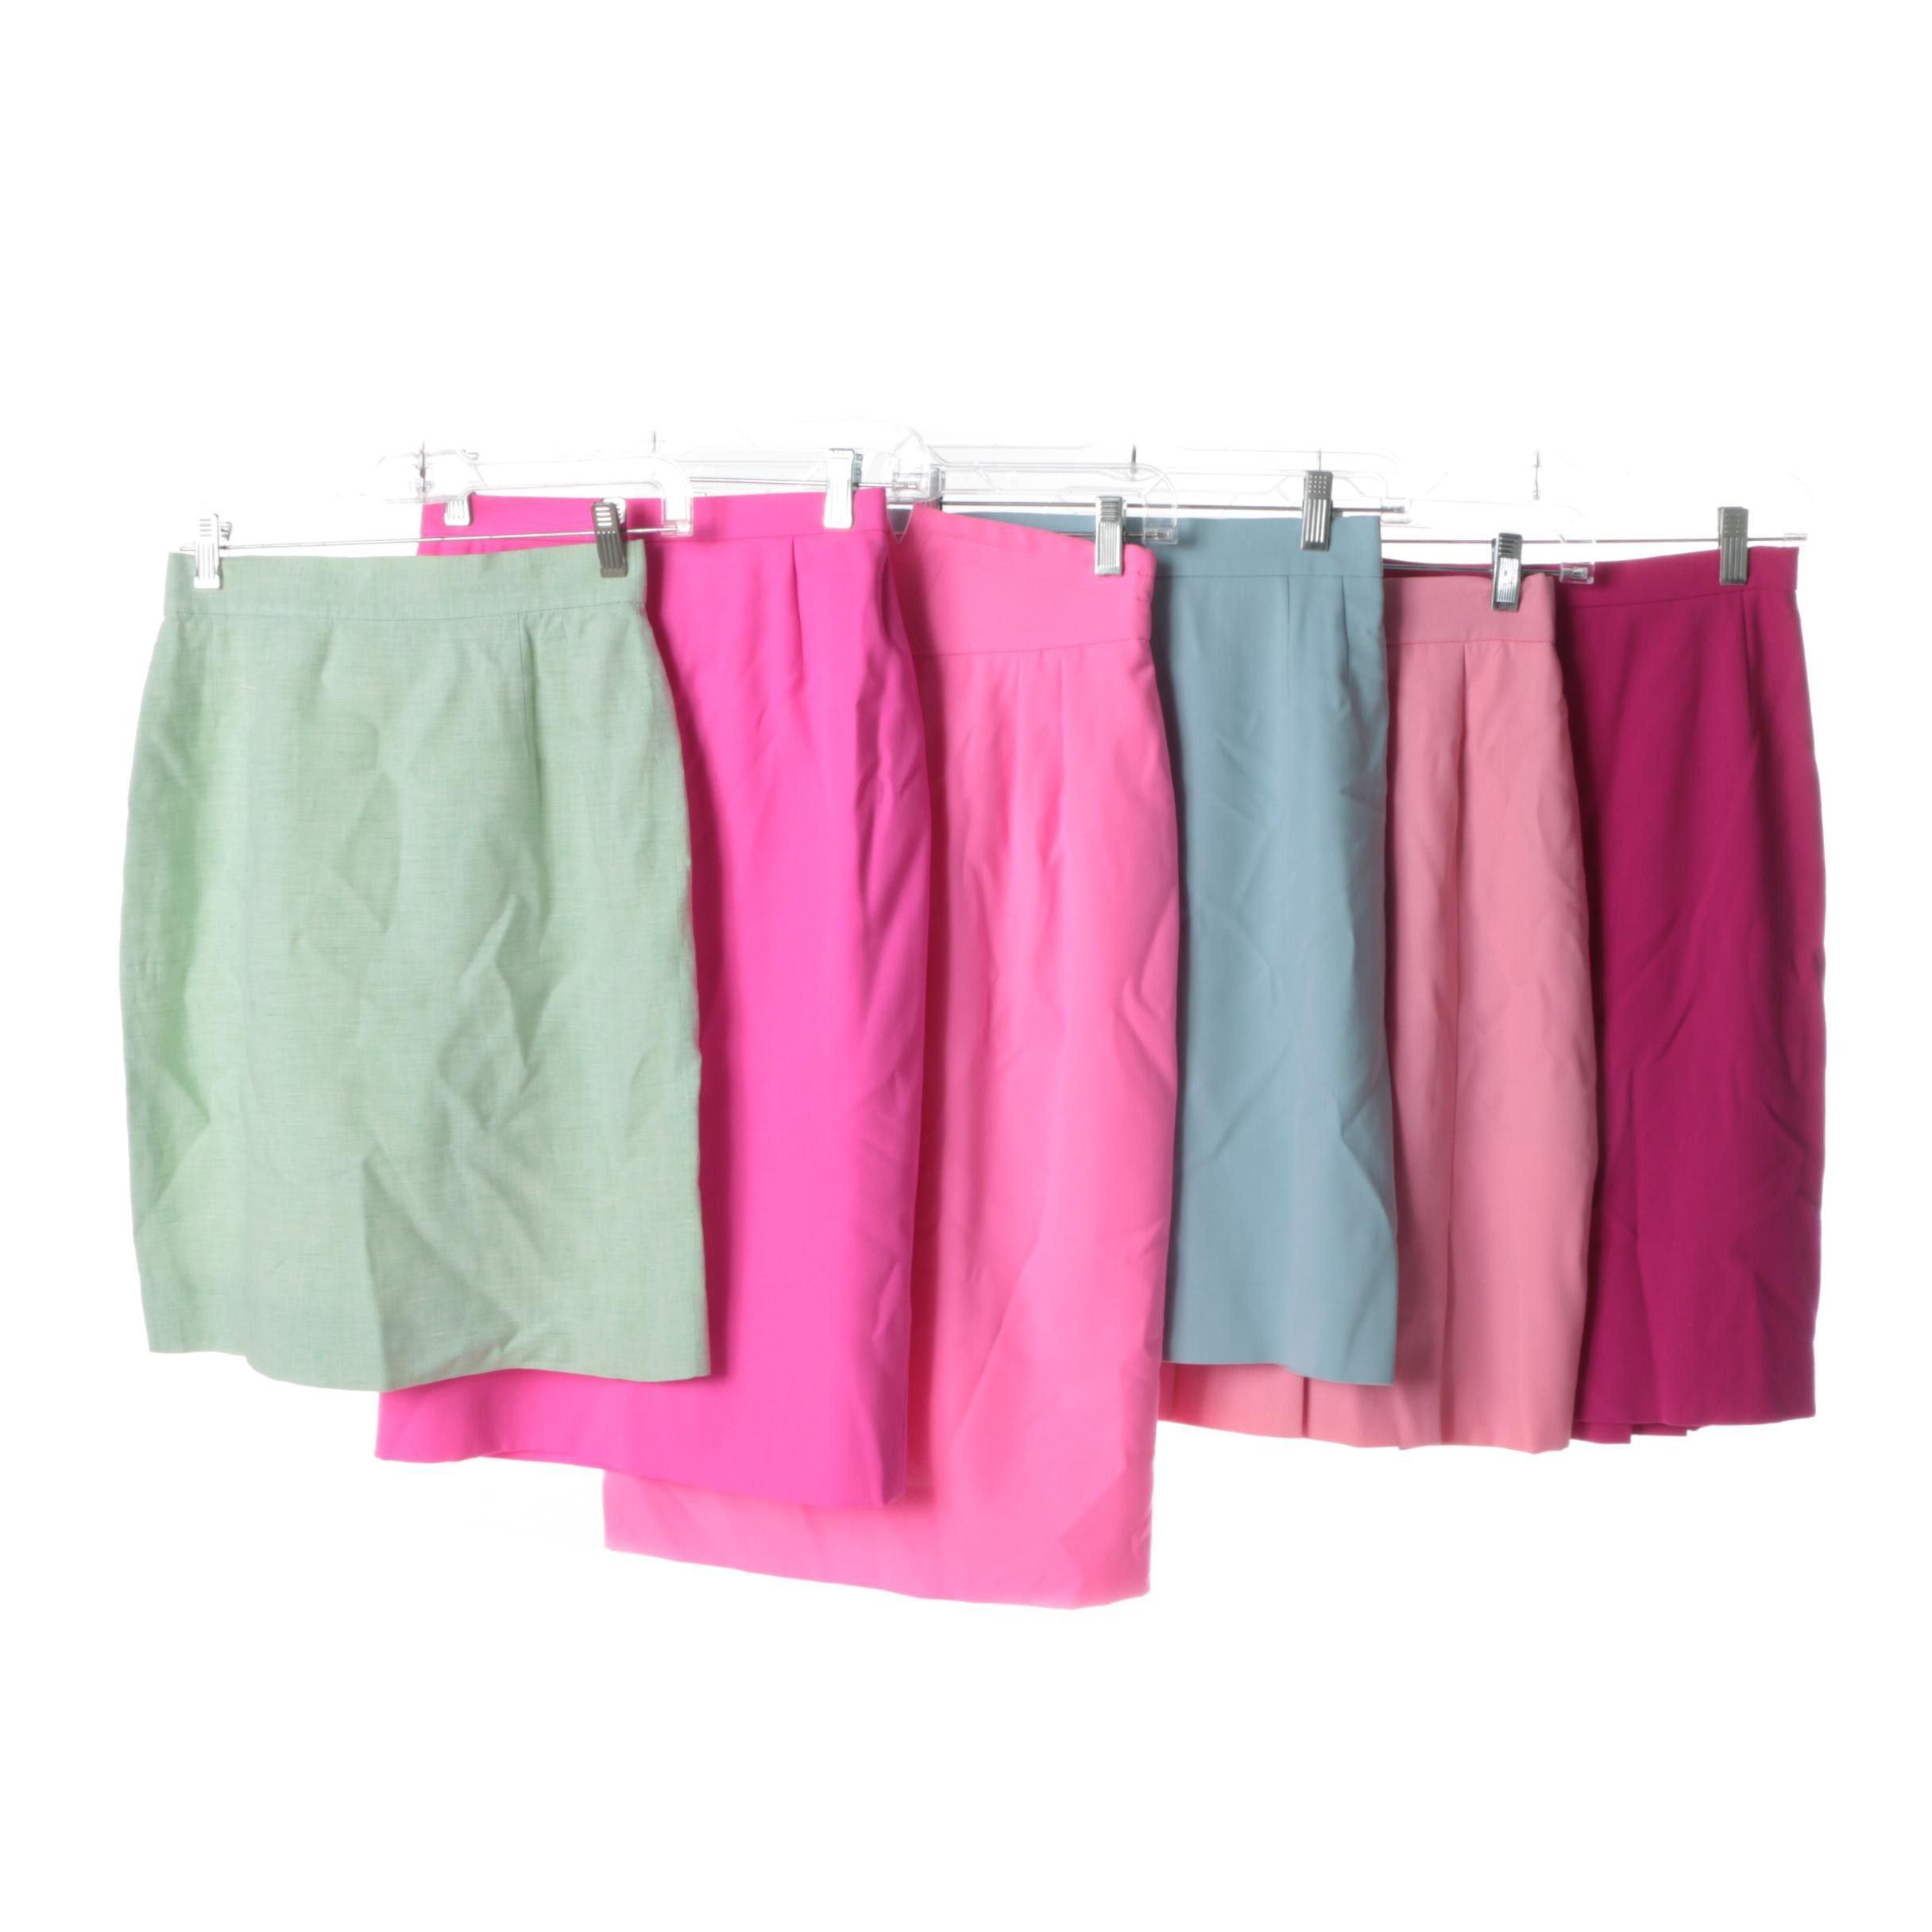 Escada by Margaretha Ley Wool and Linen Pencil Skirts